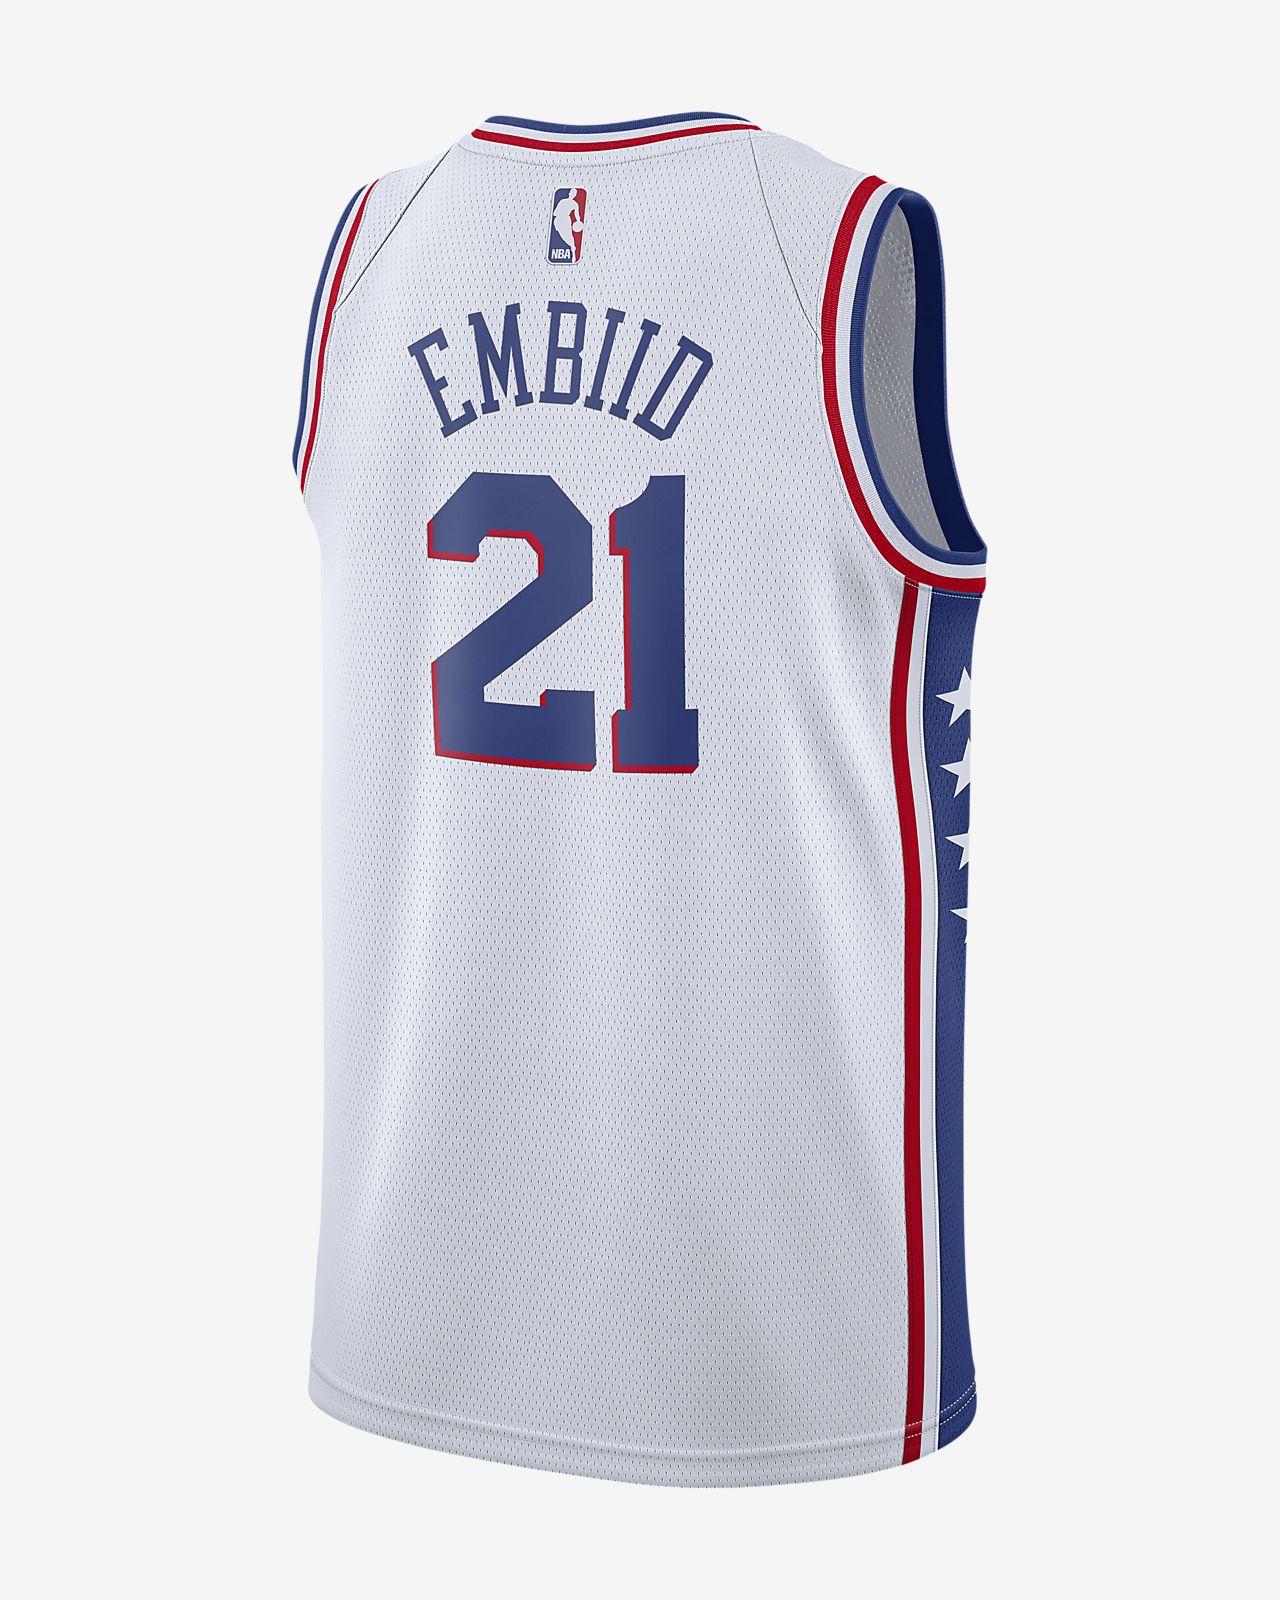 bc5ebaec1 ... Joel Embiid Association Edition Swingman (Philadelphia 76ers) Men's Nike  NBA Connected Jersey